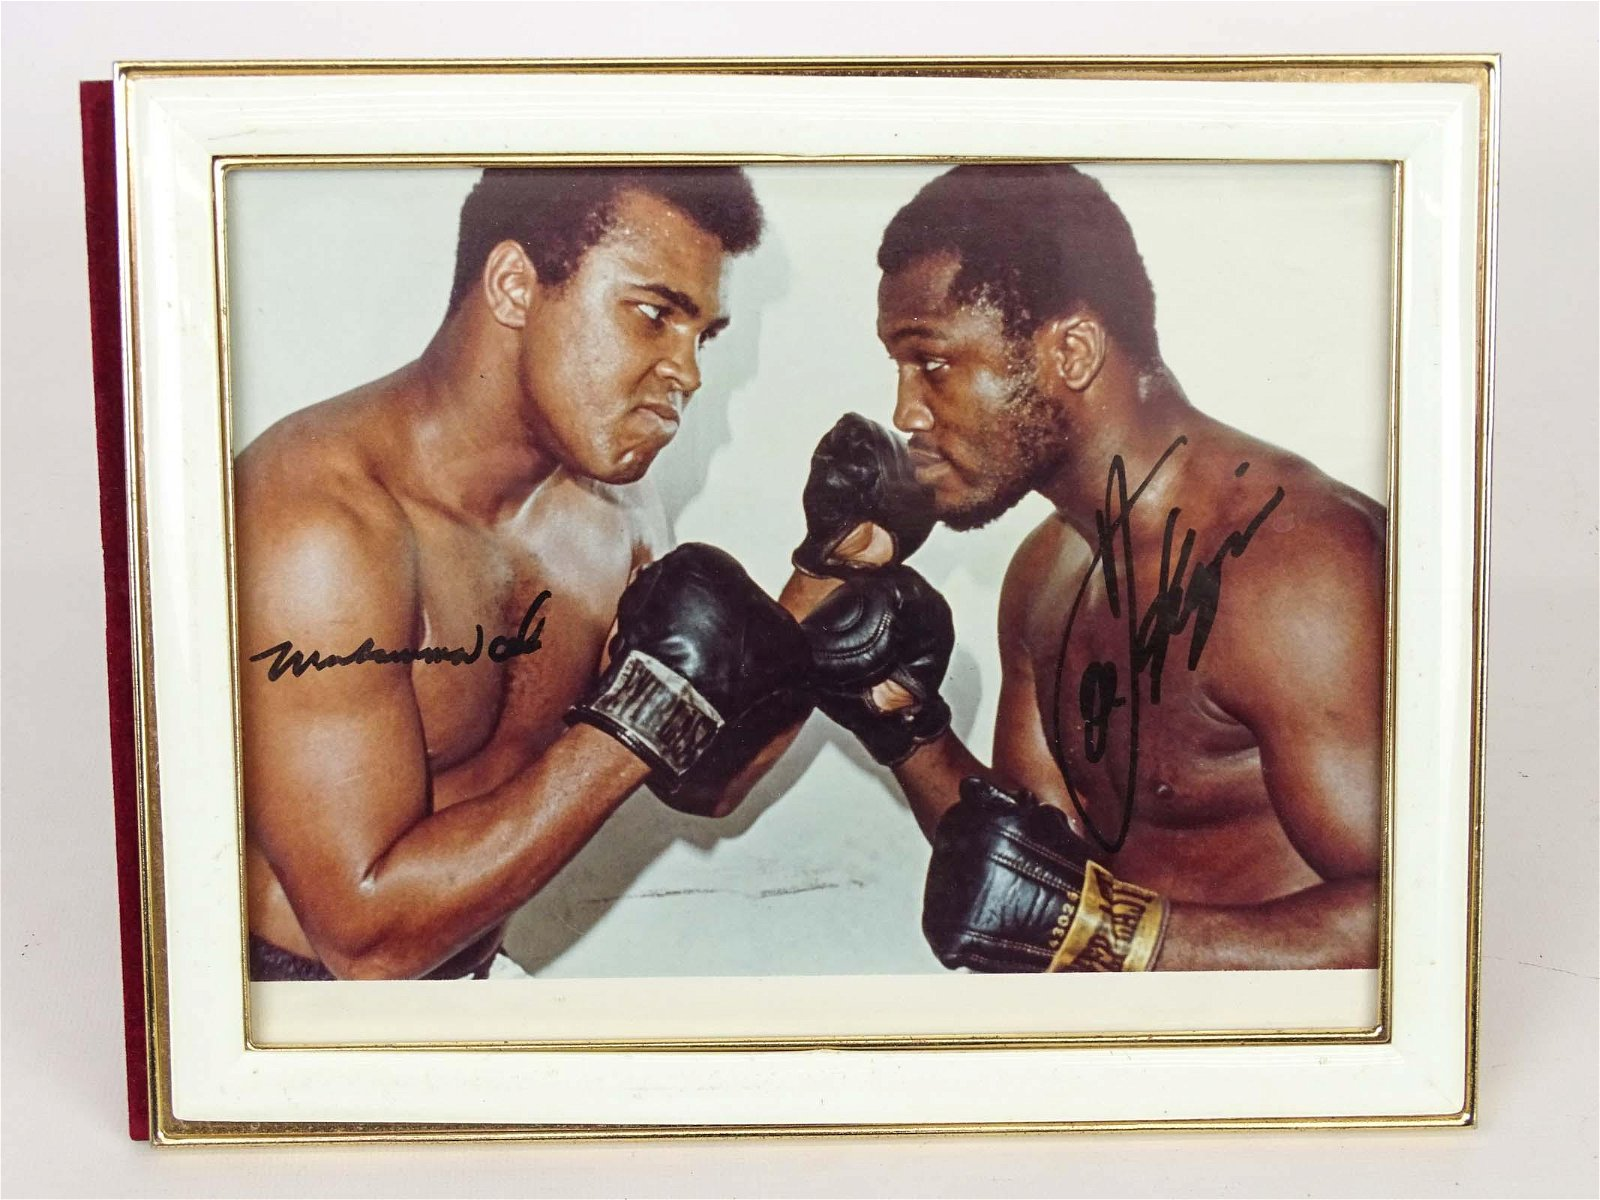 Muhammad Ali & Joe Frazier Autograph